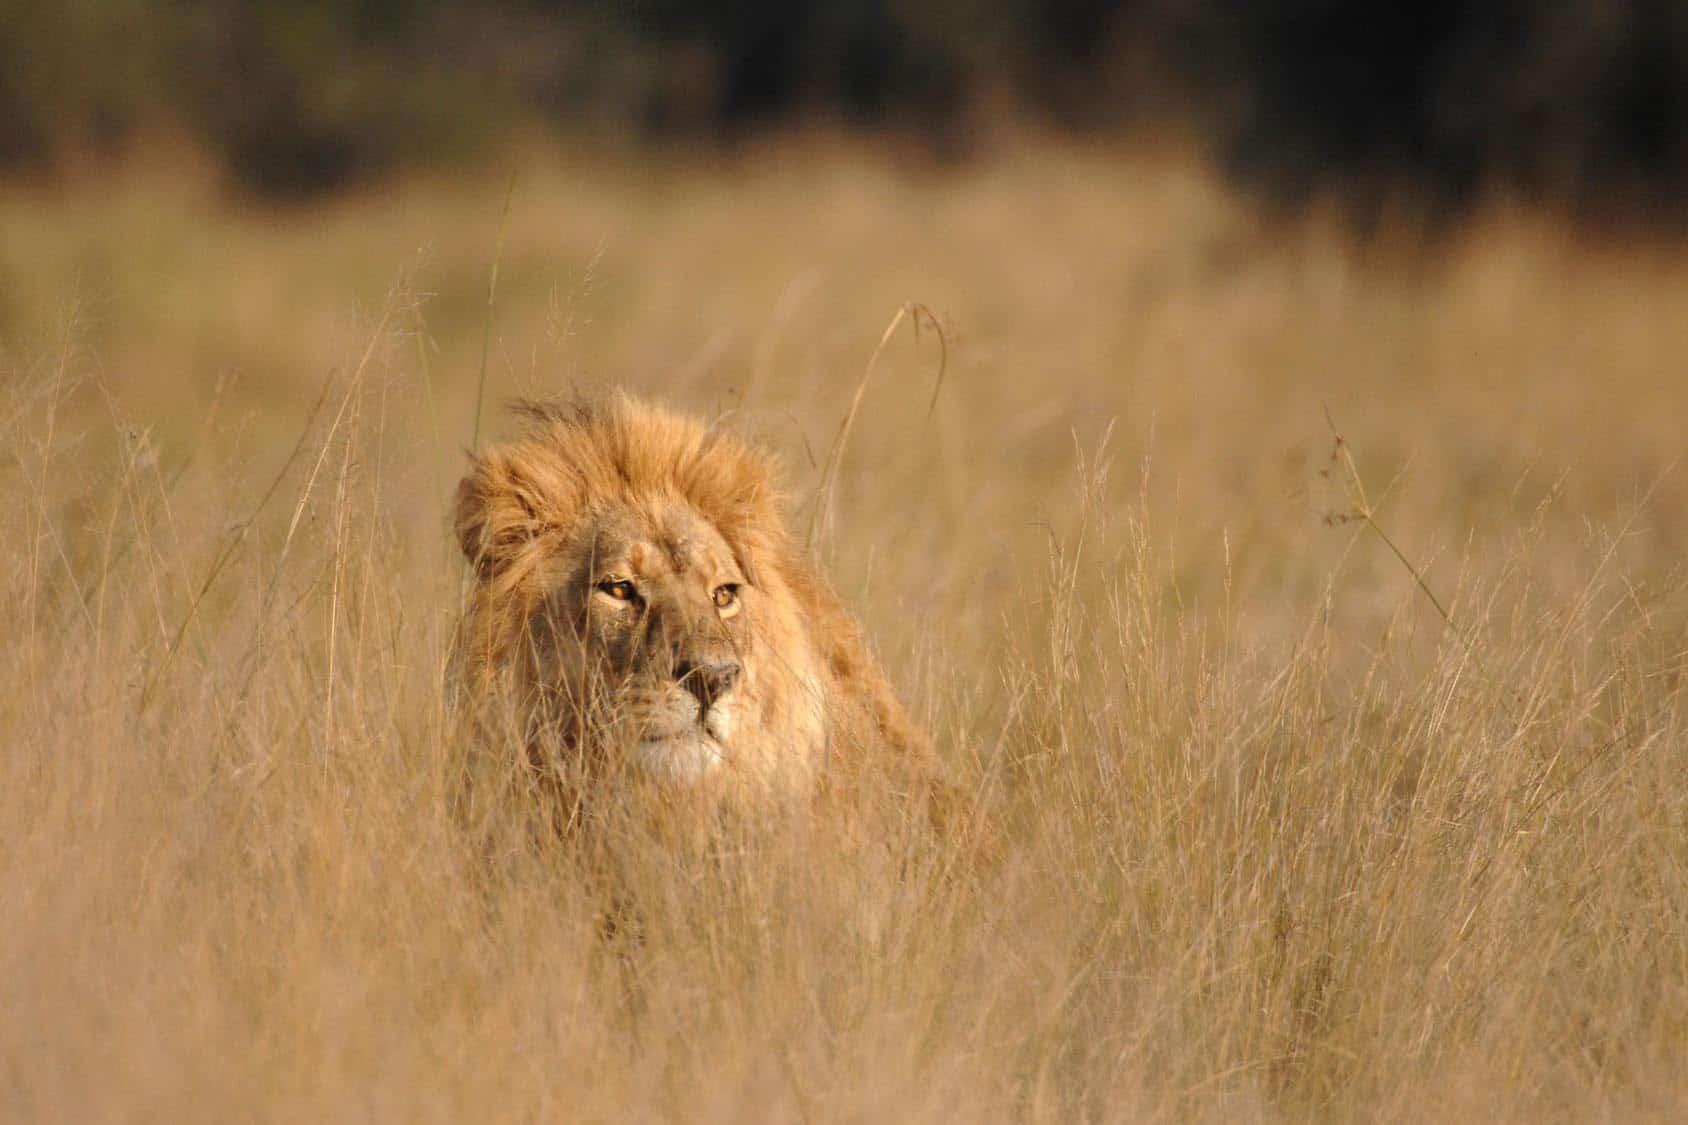 Male Lion Hiding In Long Grass